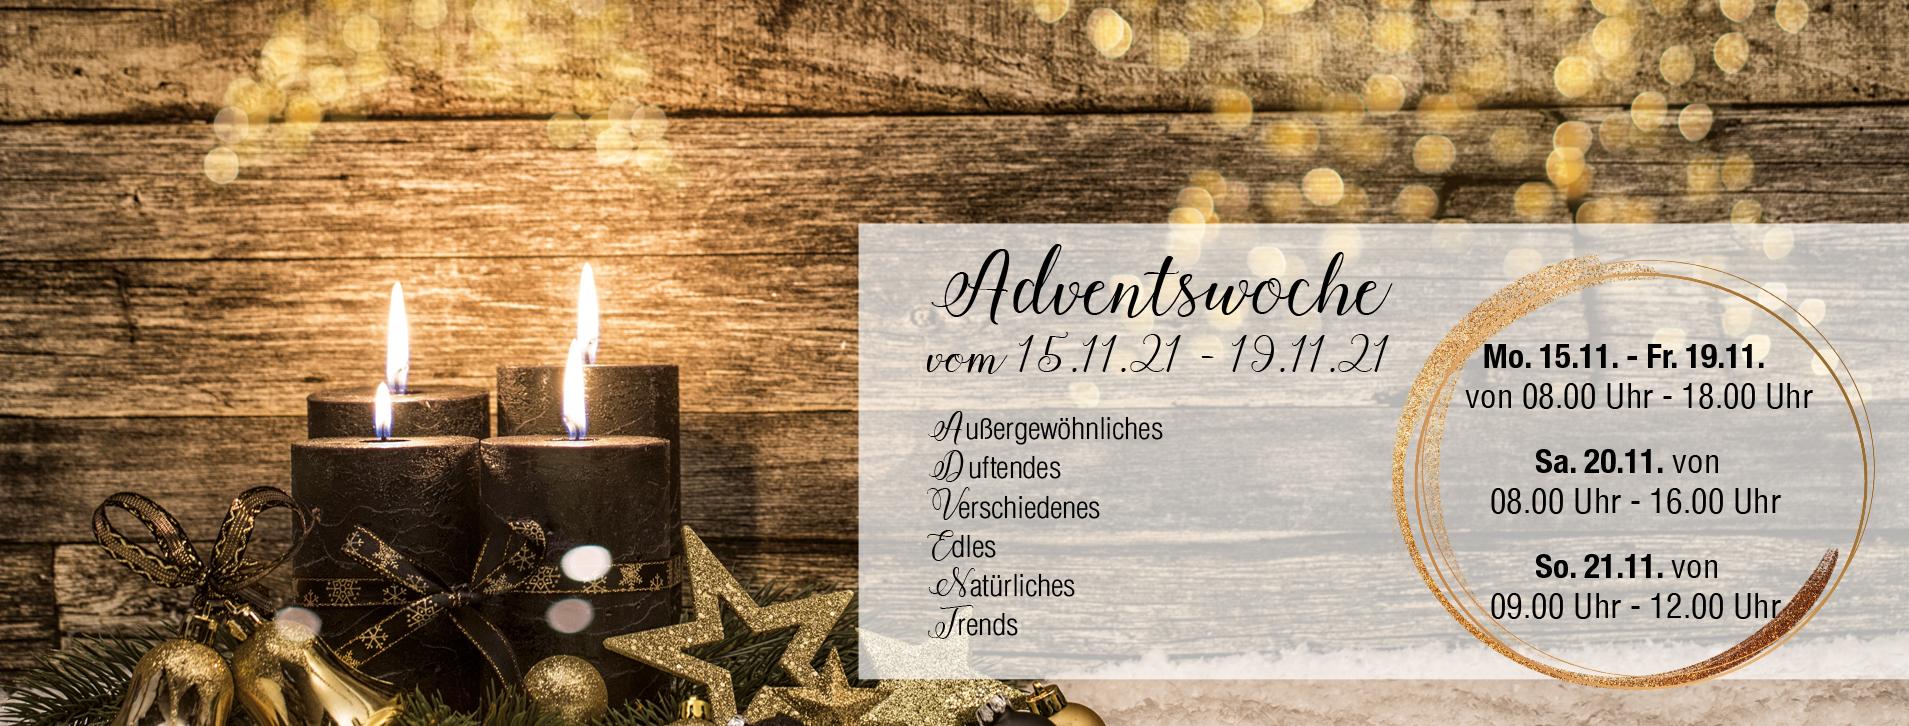 adventswoche2021